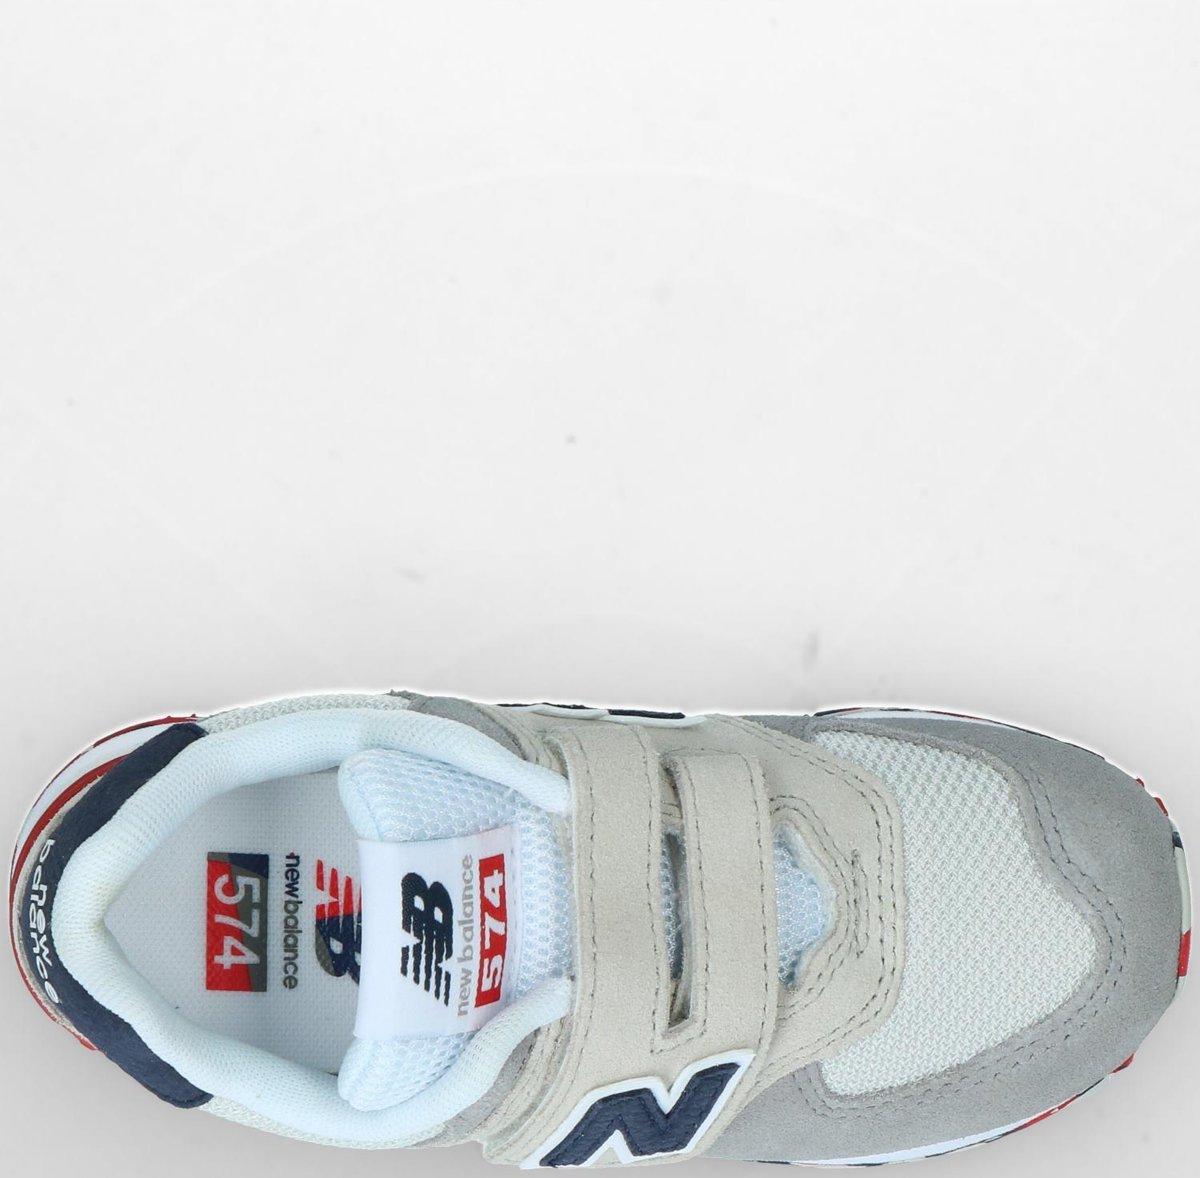 70371e054a1 bol.com   New Balance Meisjes Sneakers Yv574 M - Beige - Maat 28